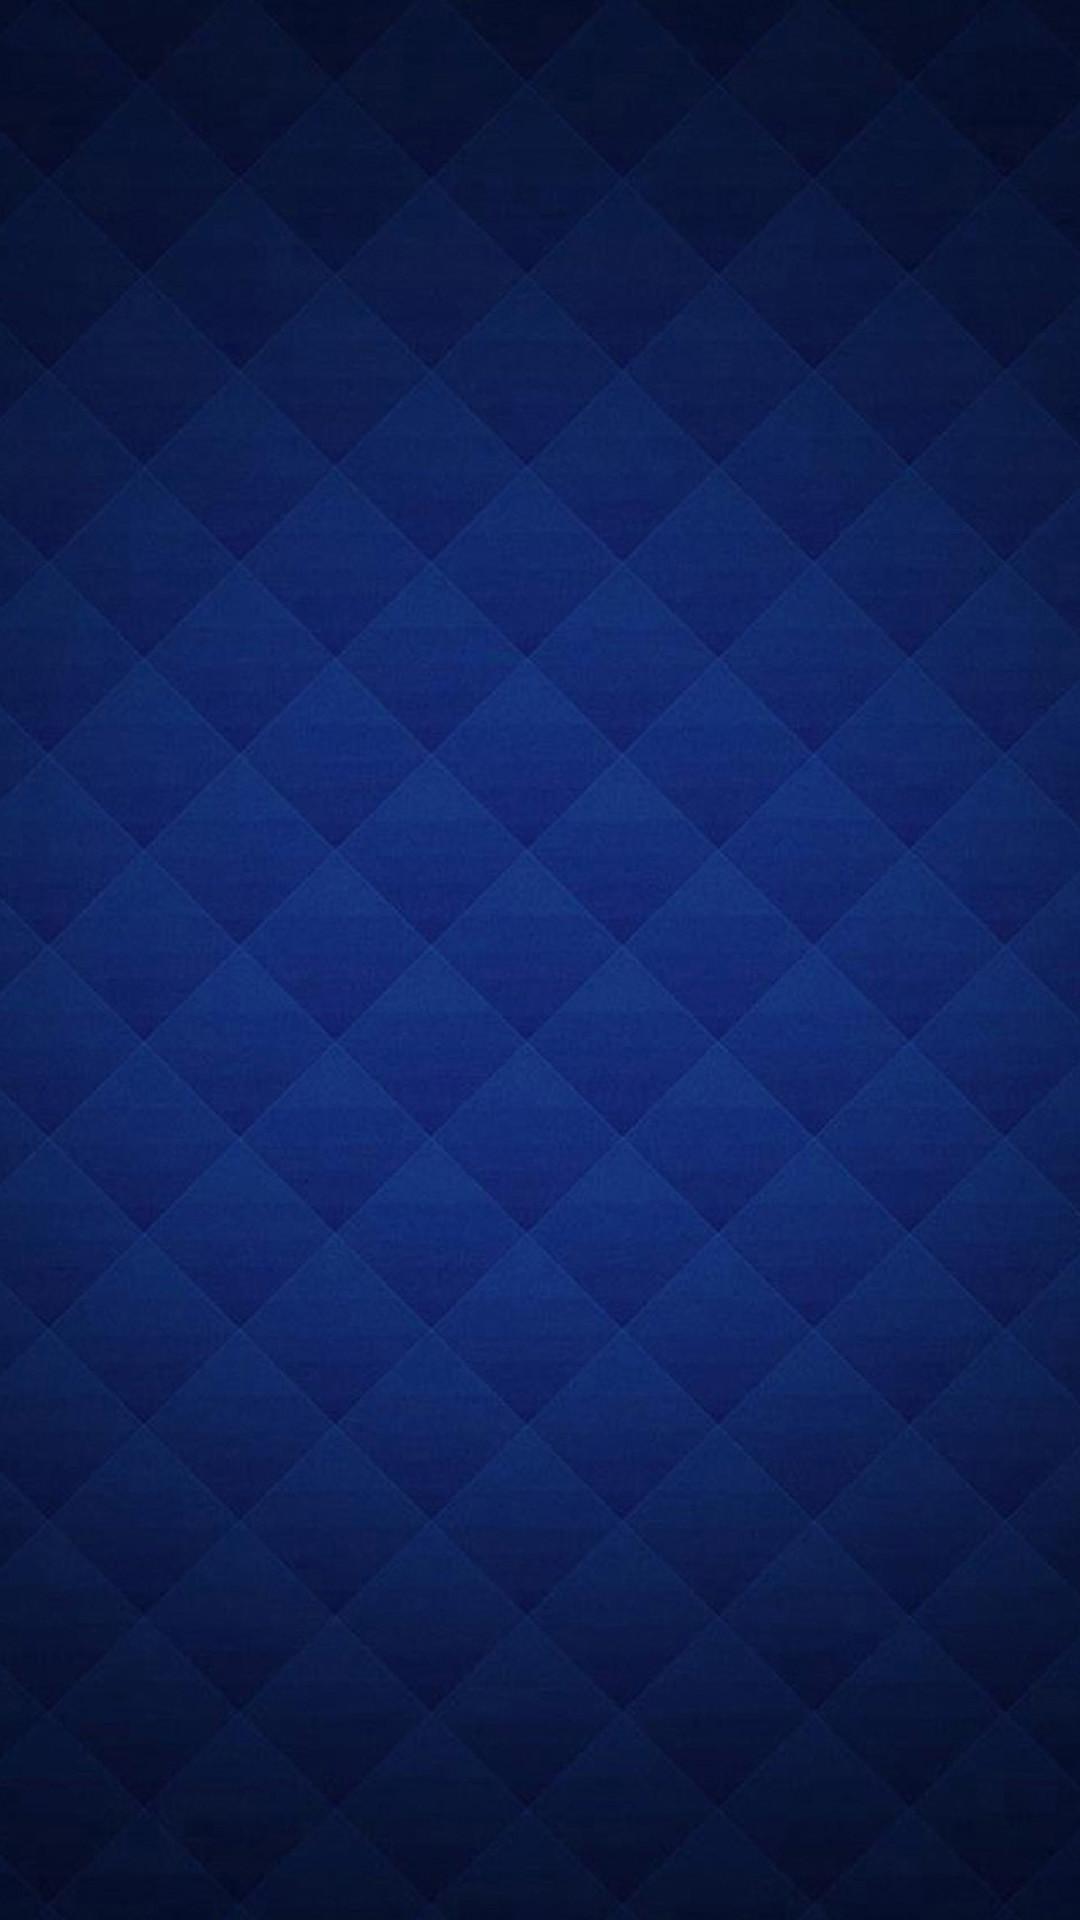 Hd Supreme Wallpaper Iphone X Light Blue Texture Wallpaper 51 Images